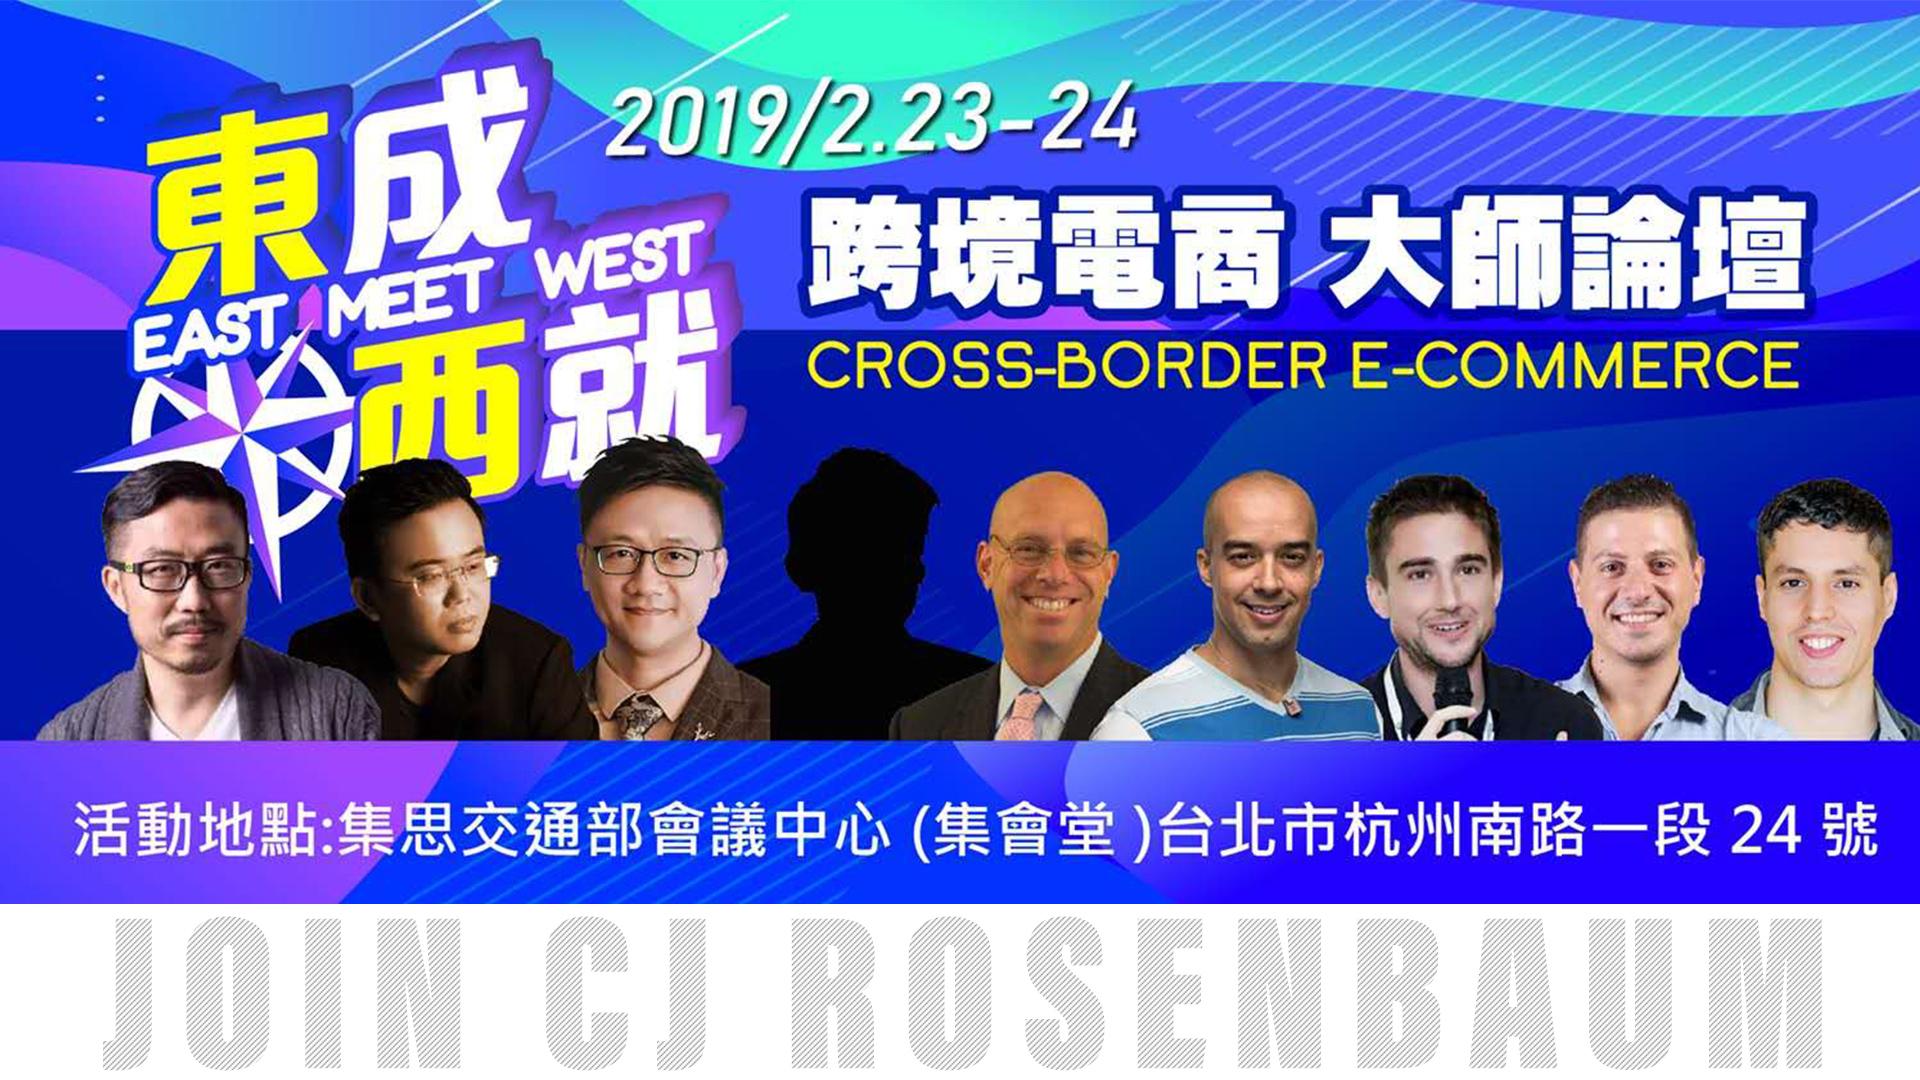 East Meet West Cross-Border e-Commerce Summit